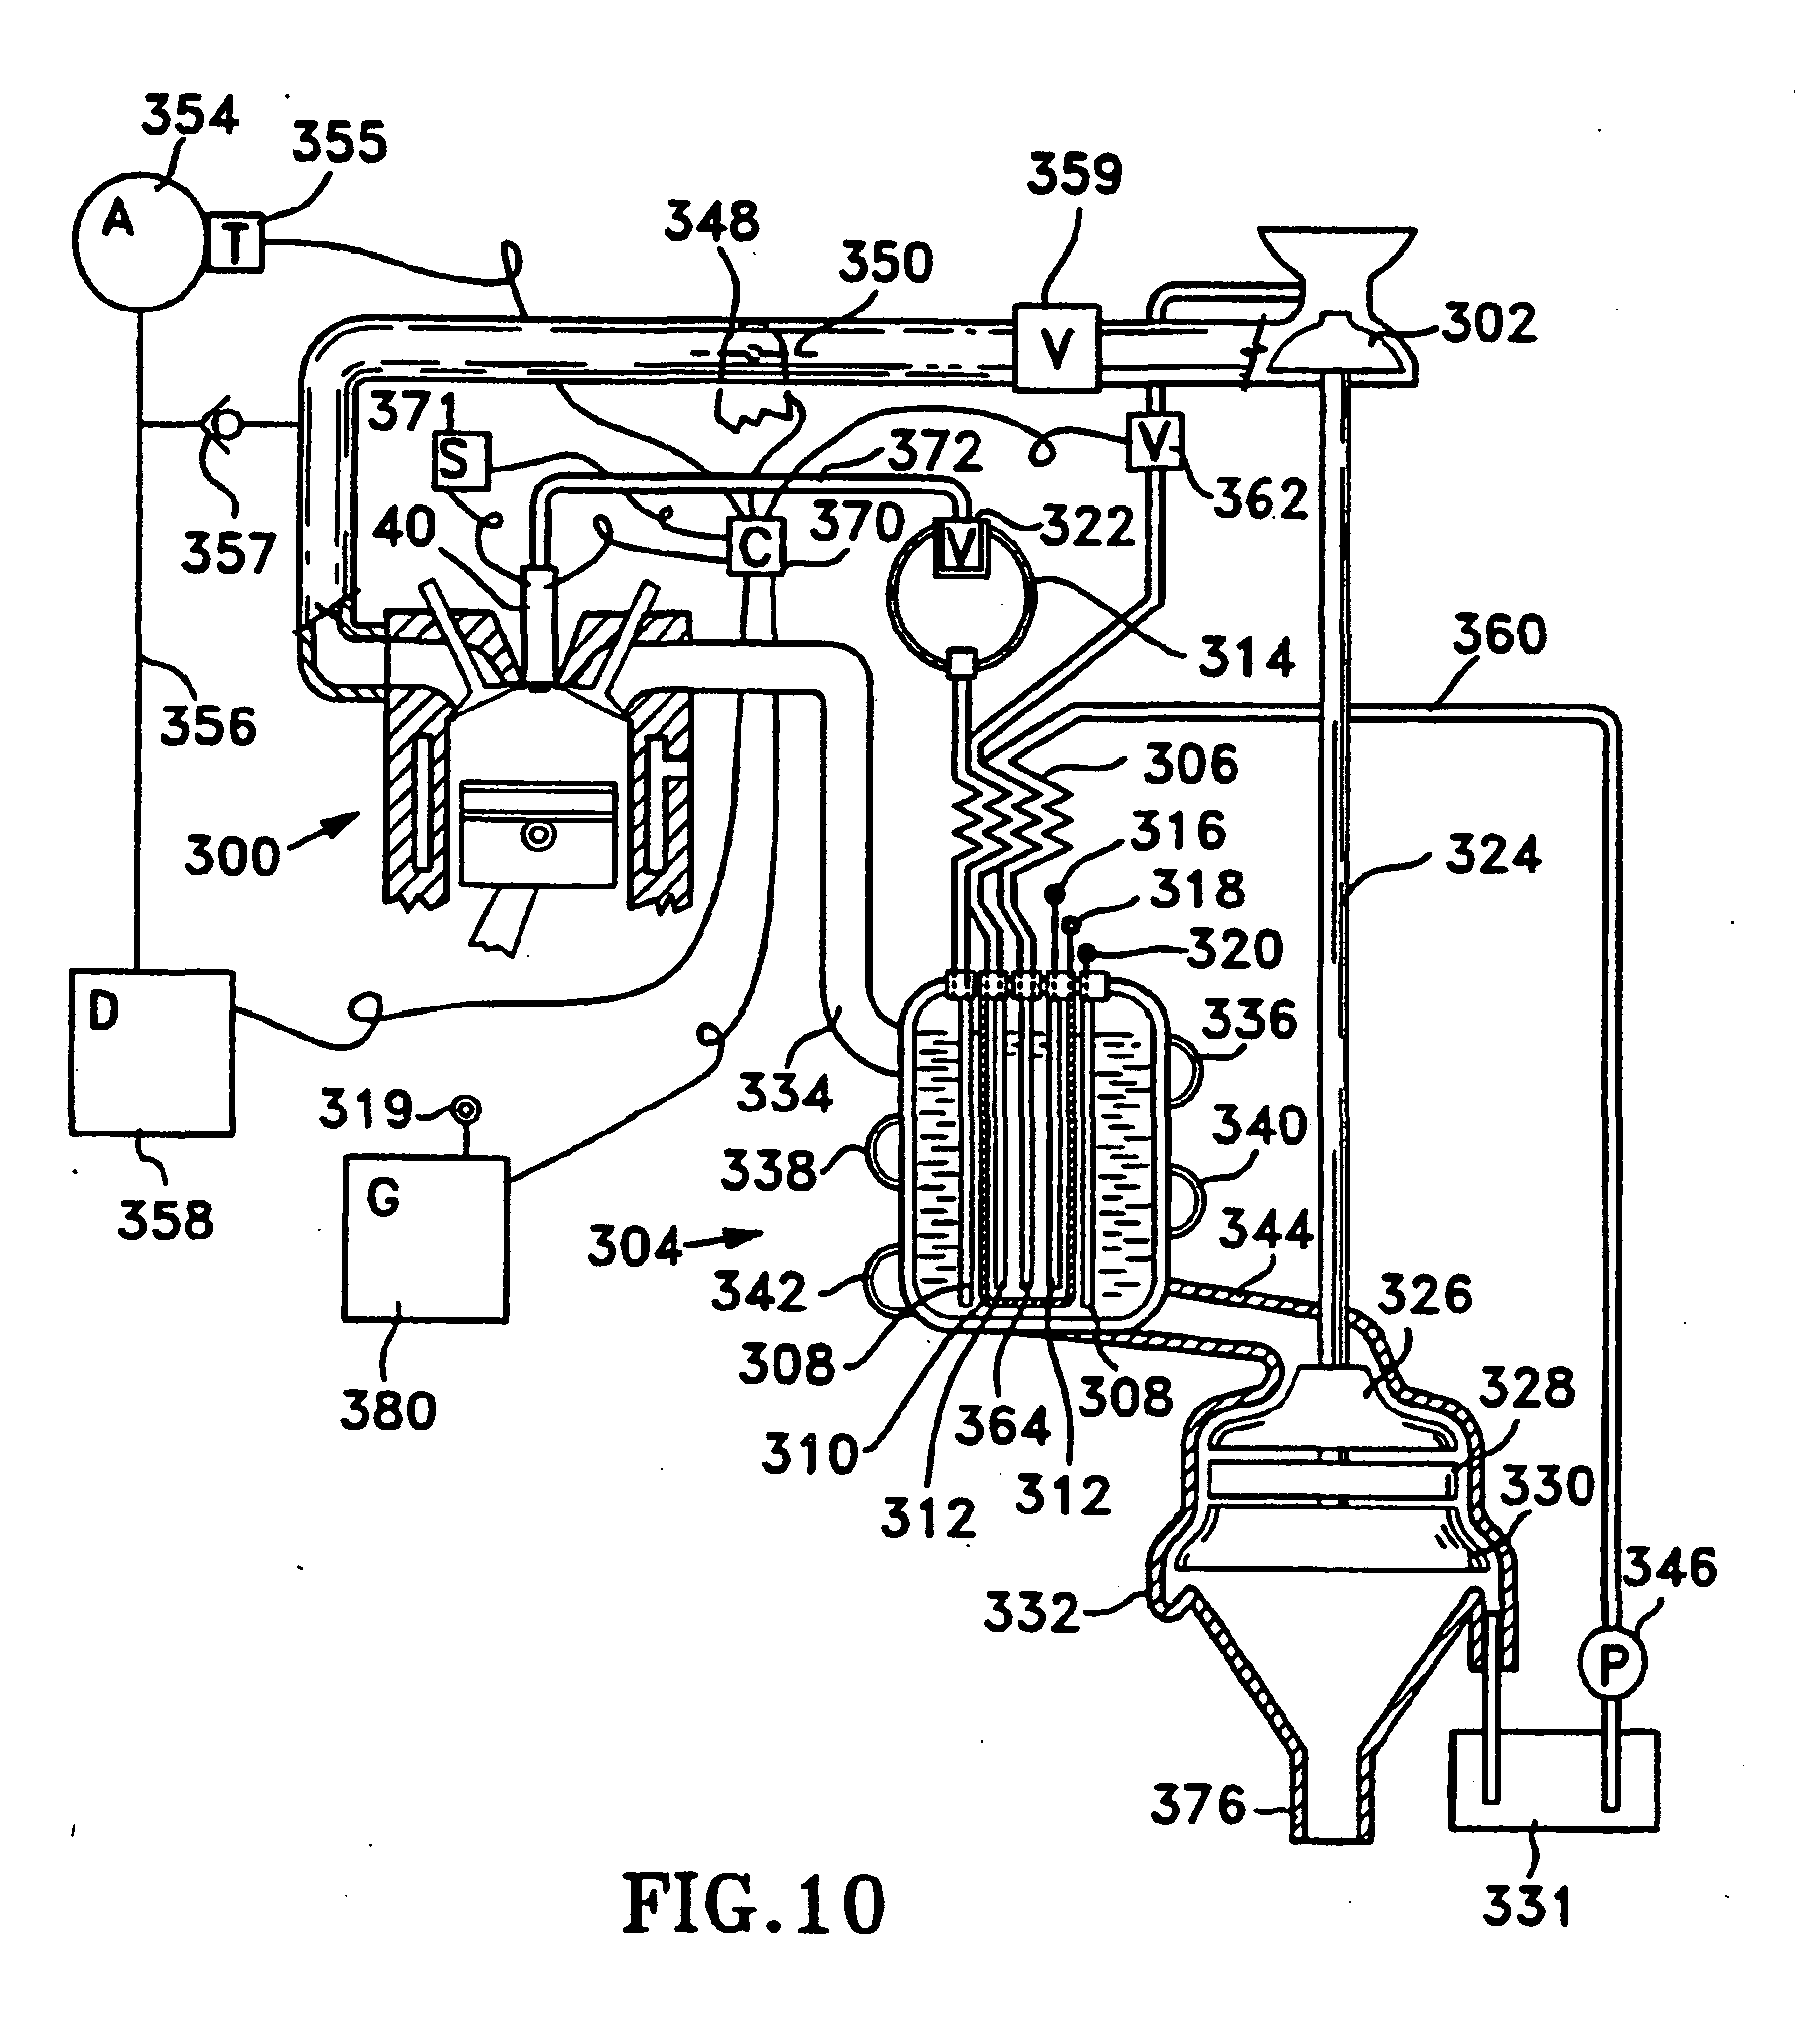 patent ep1662113b1